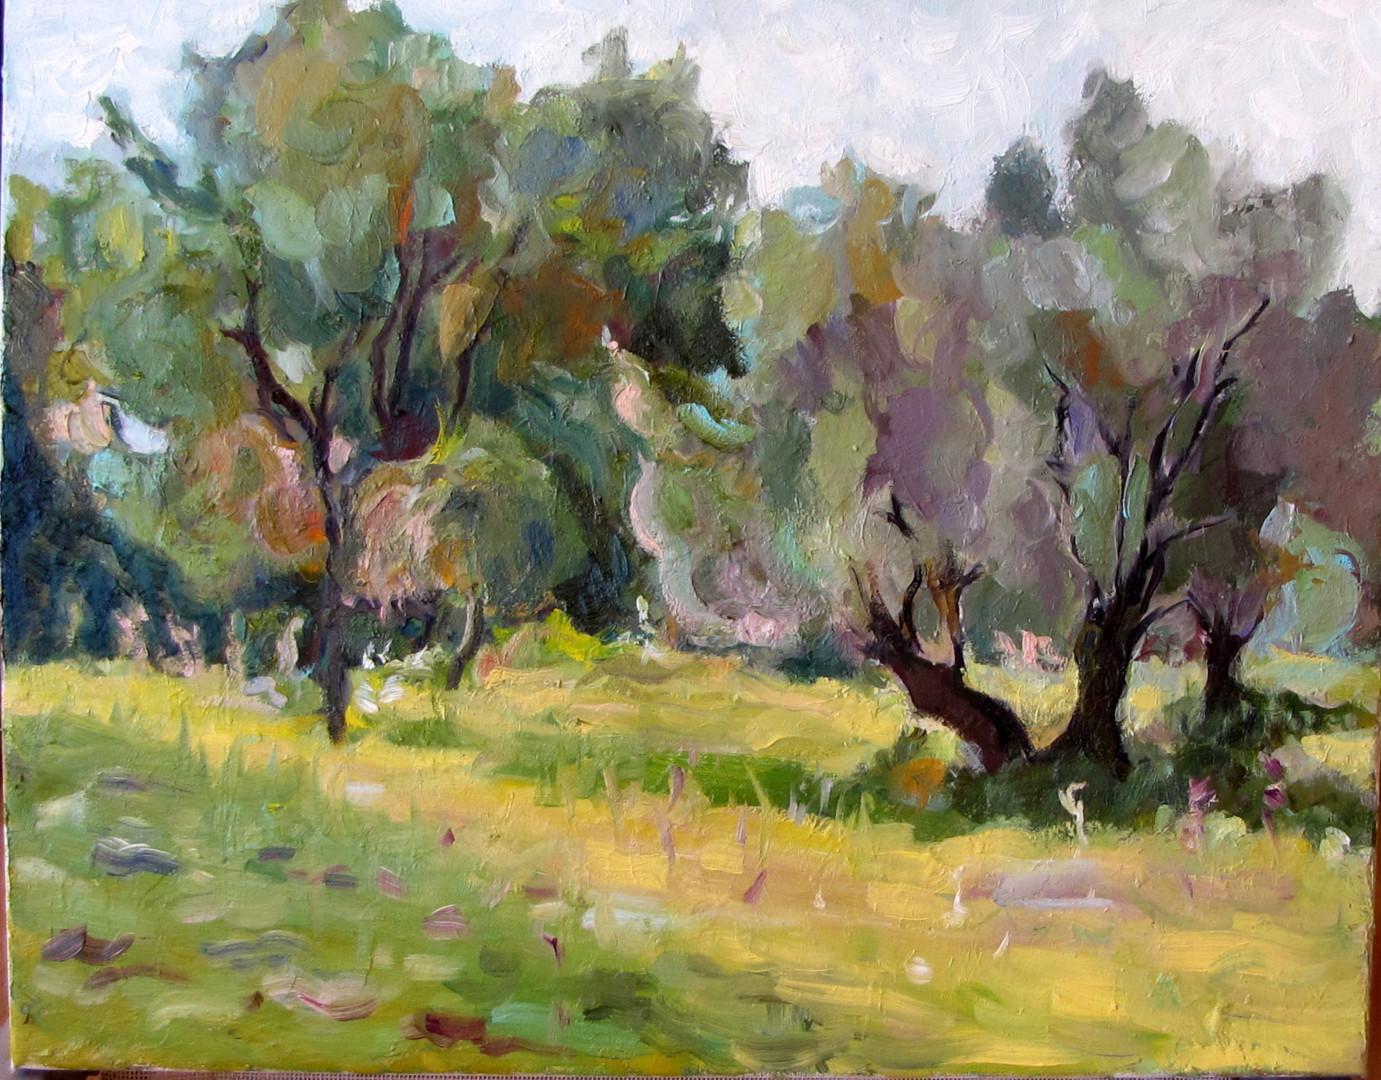 lubalem - 2-landscape-oil-on-canvas-40x50cm.jpg